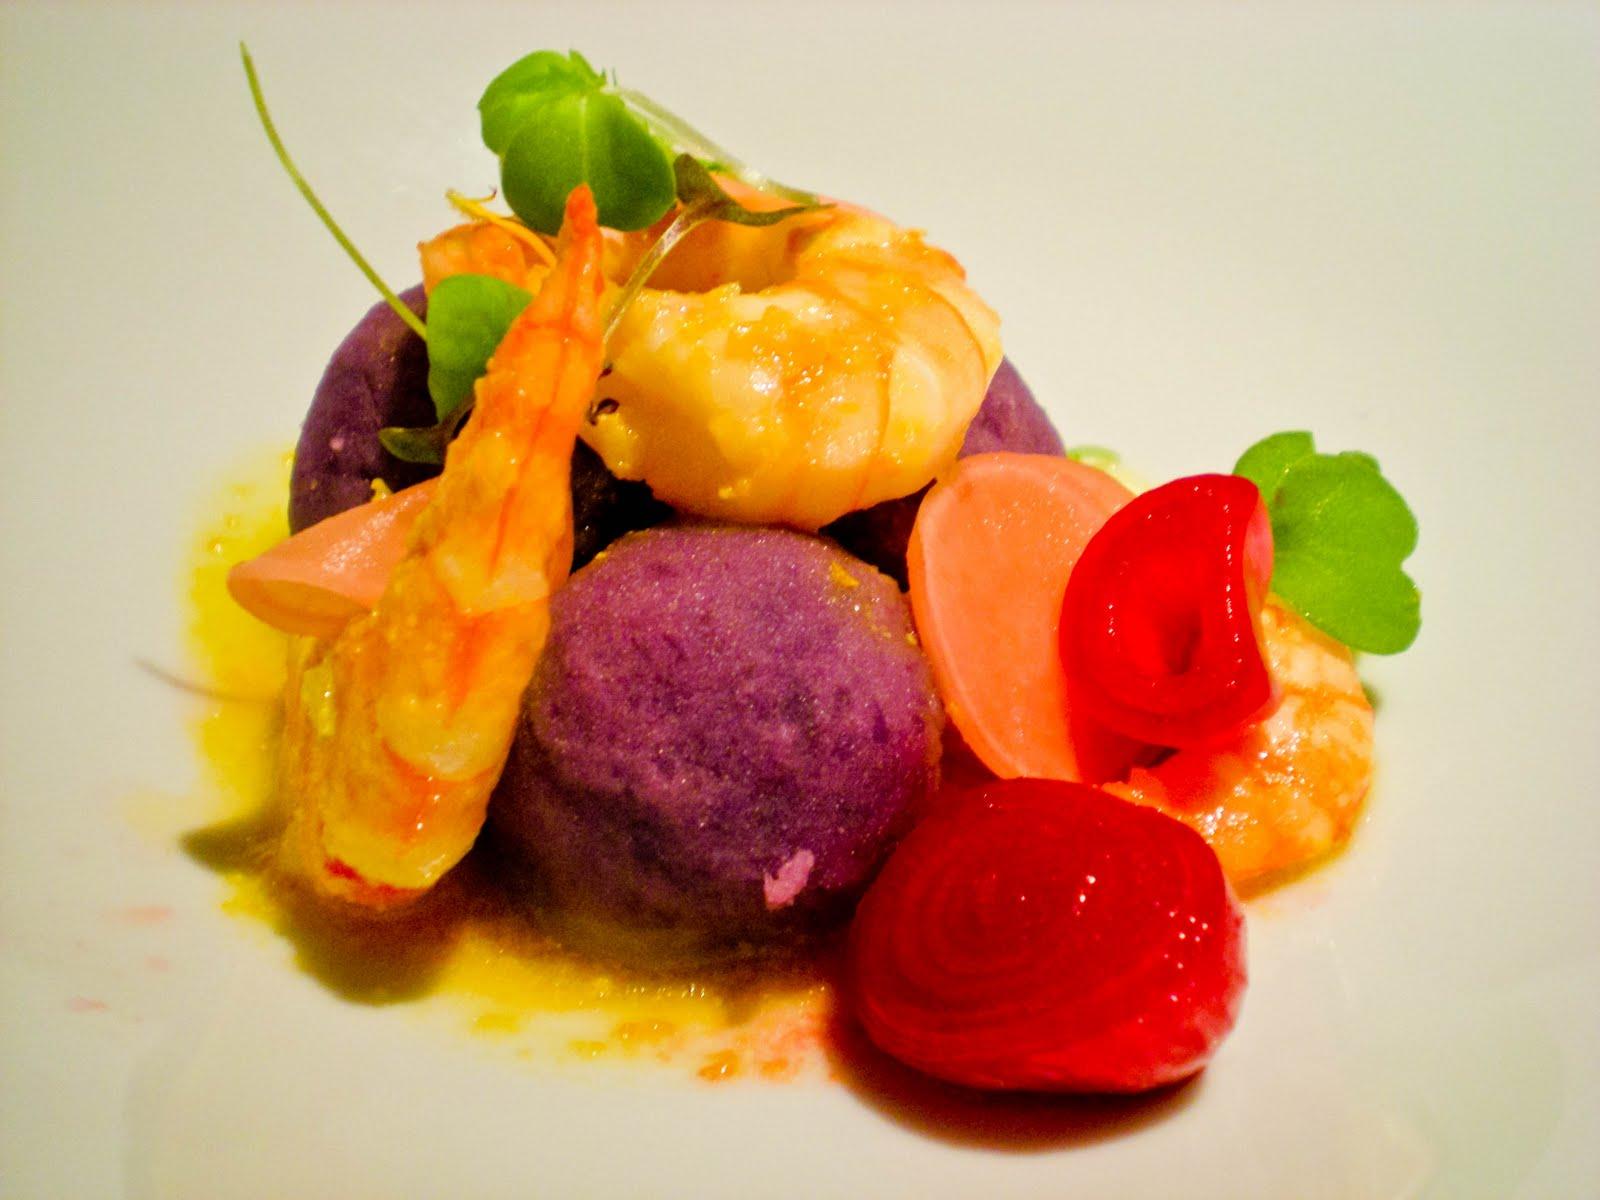 Random Cuisine: Nuevo Latino Cuisine chez Raza